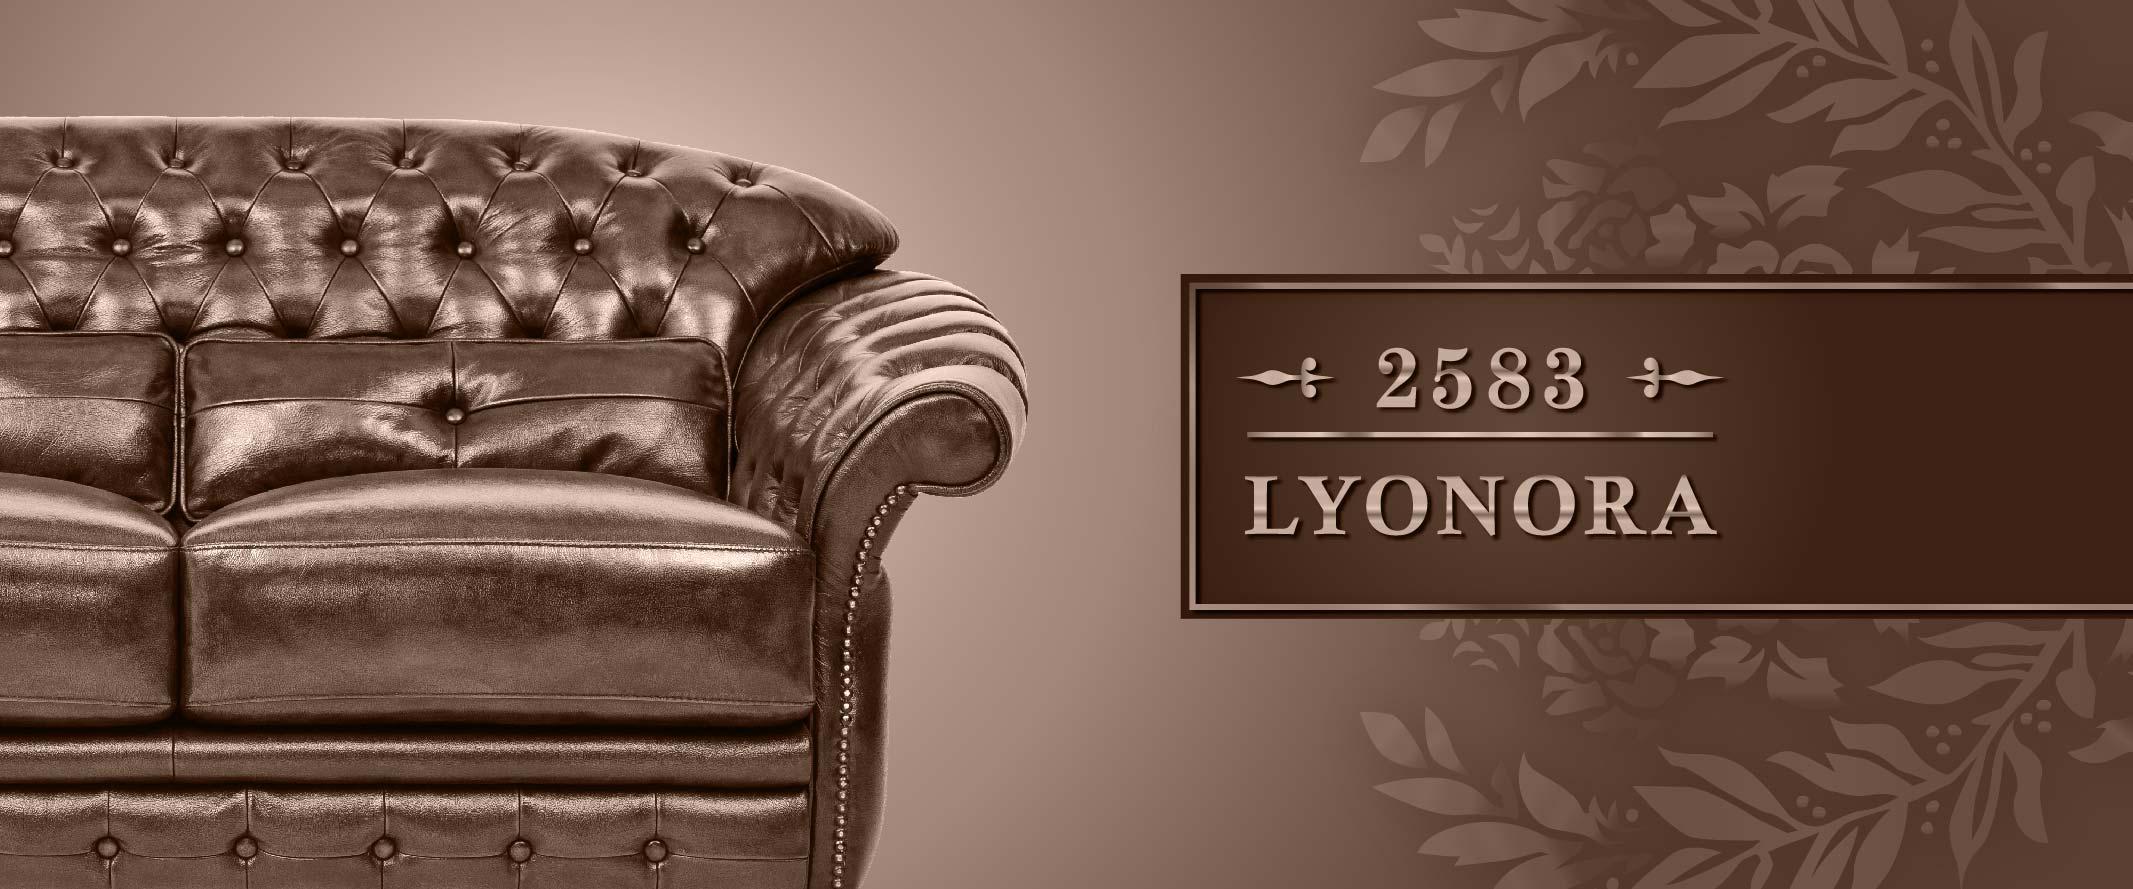 product-2583-lyonara-hover